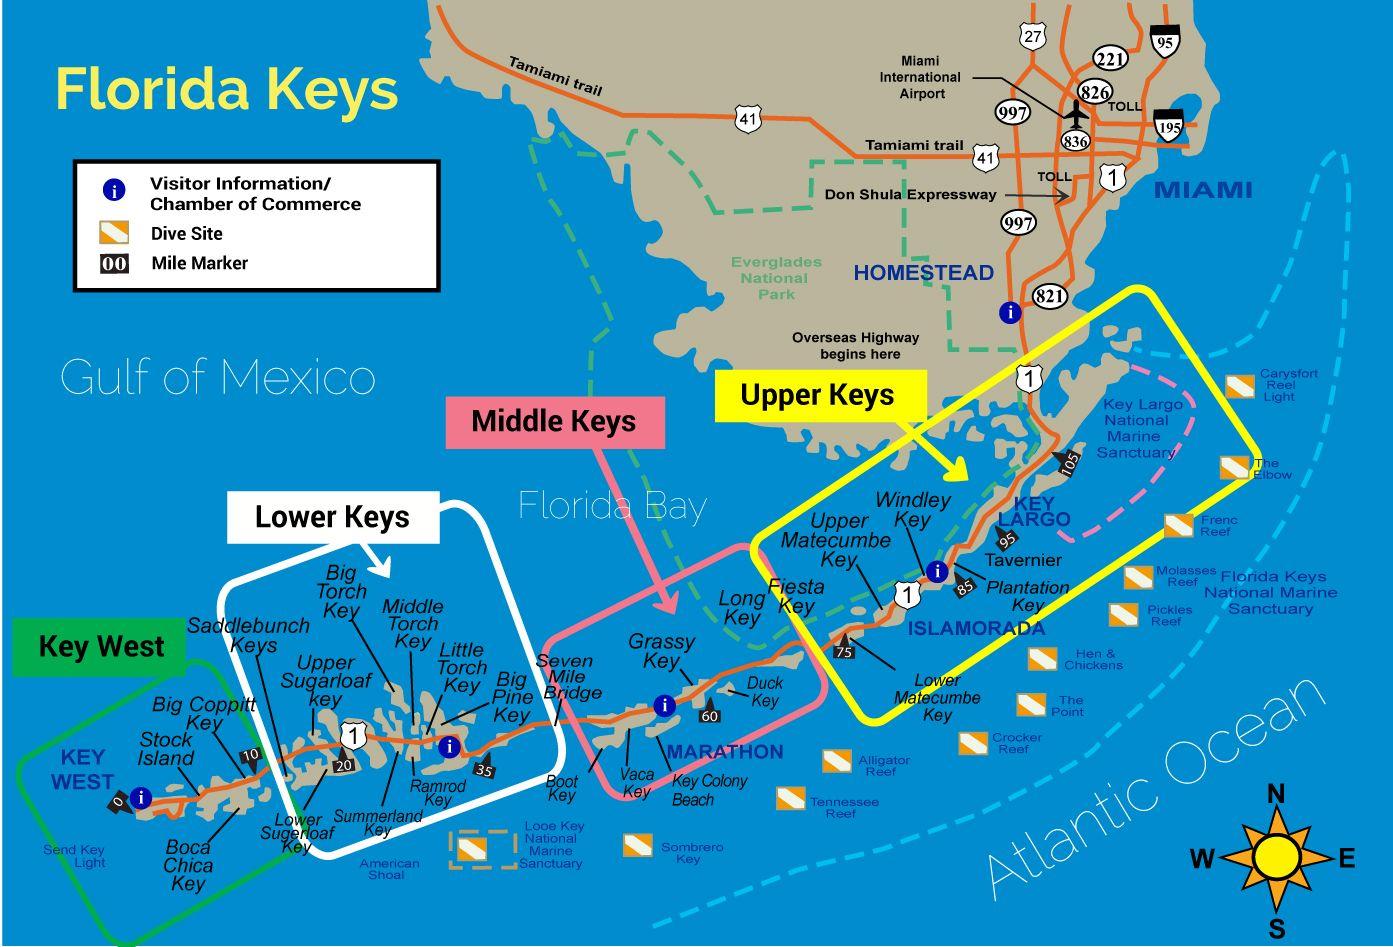 Map Of Areas Servedflorida Keys Vacation Rentals | Vacation - Florida Keys Highway Map